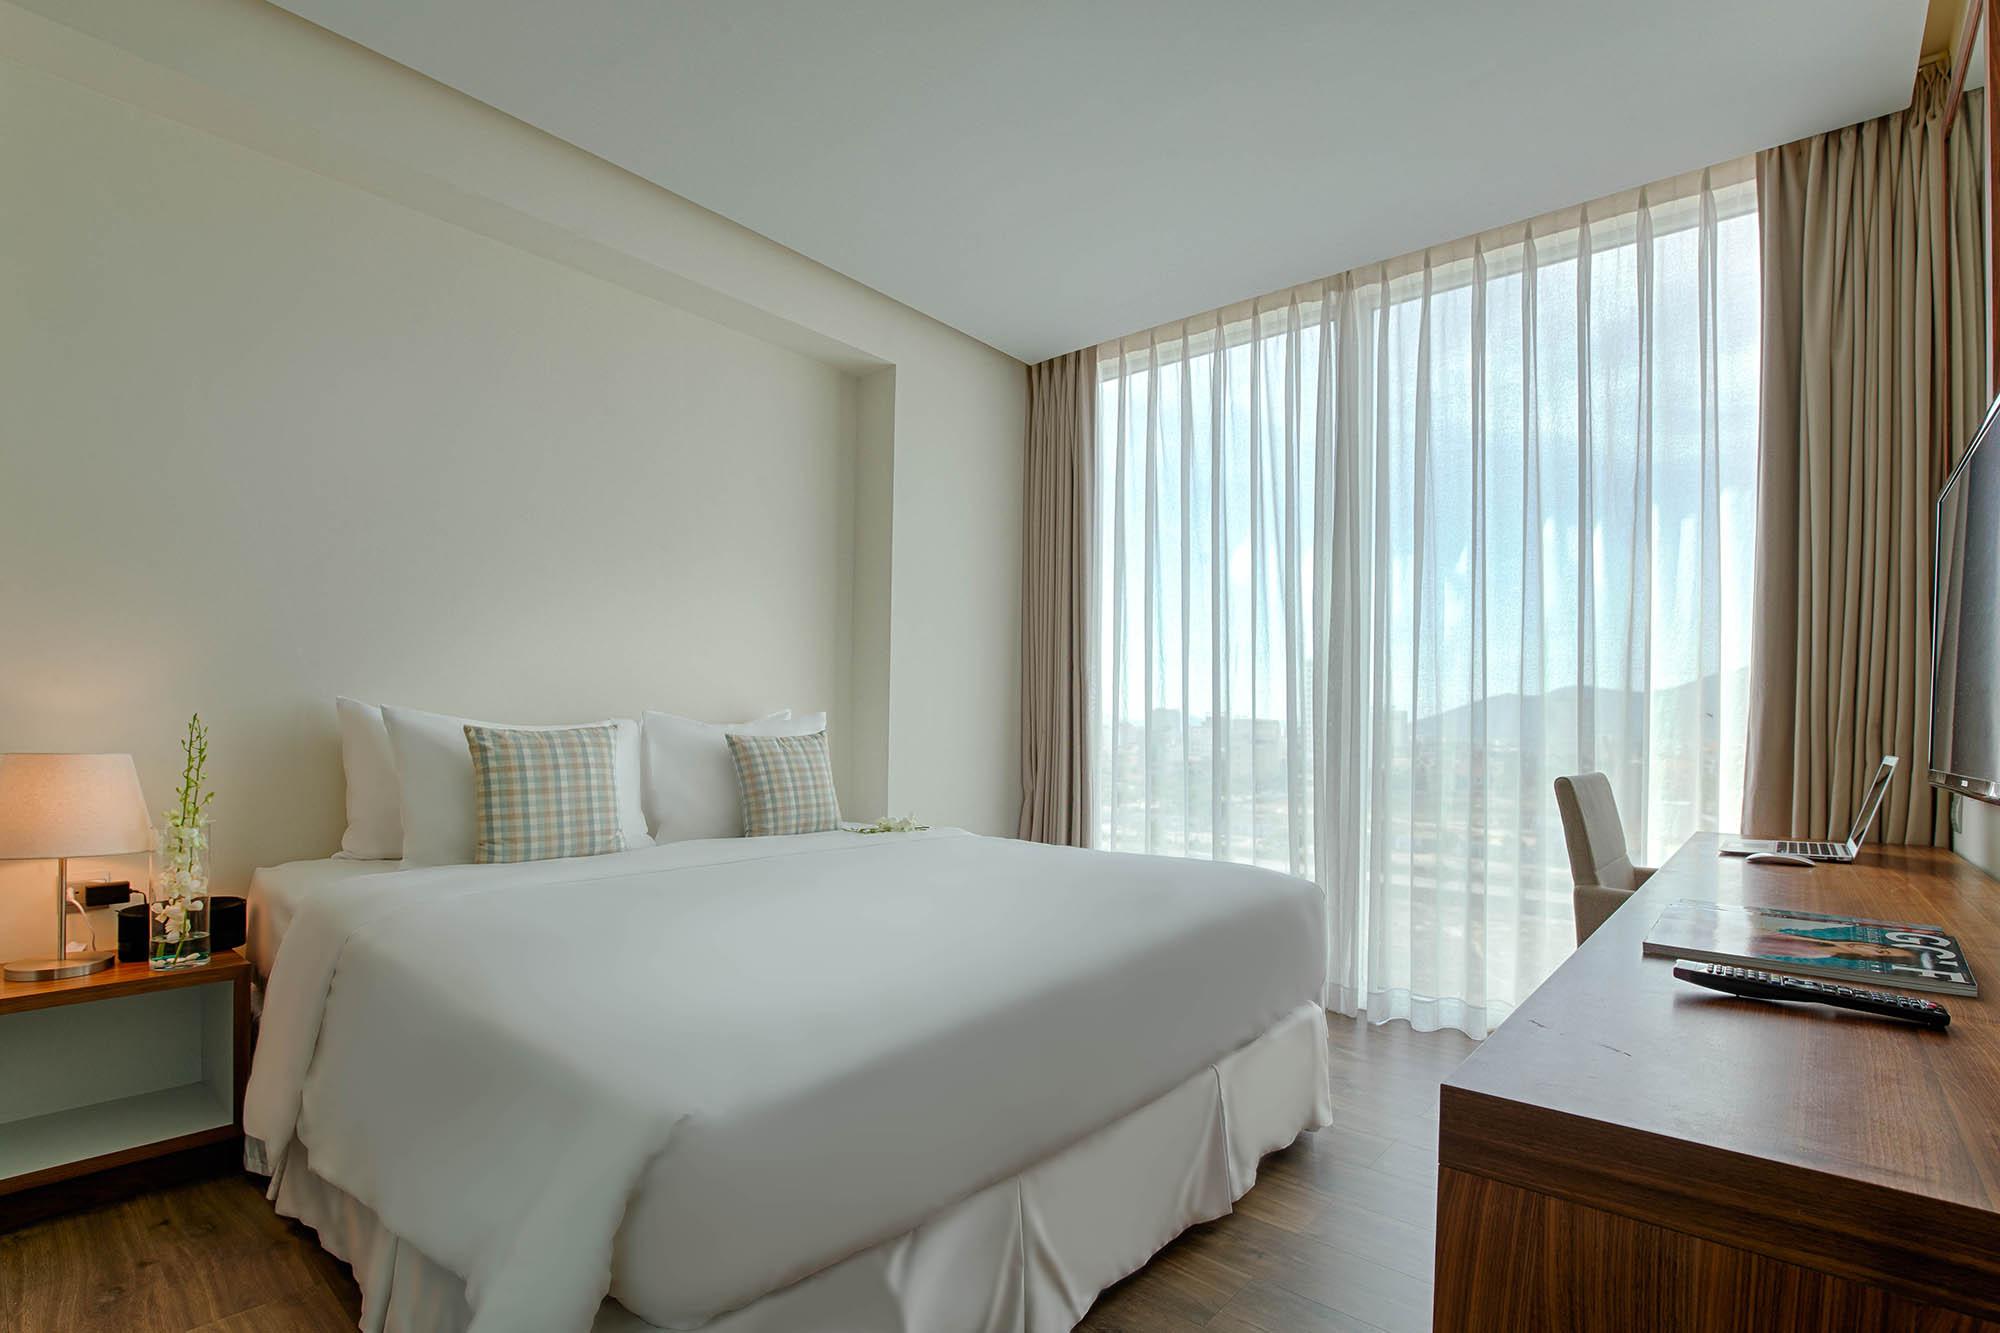 Highlight Plus Apartment A La Carte Danang Beach Hotel 200 Vo Nguyen Giap Danang Fantasticity Com03